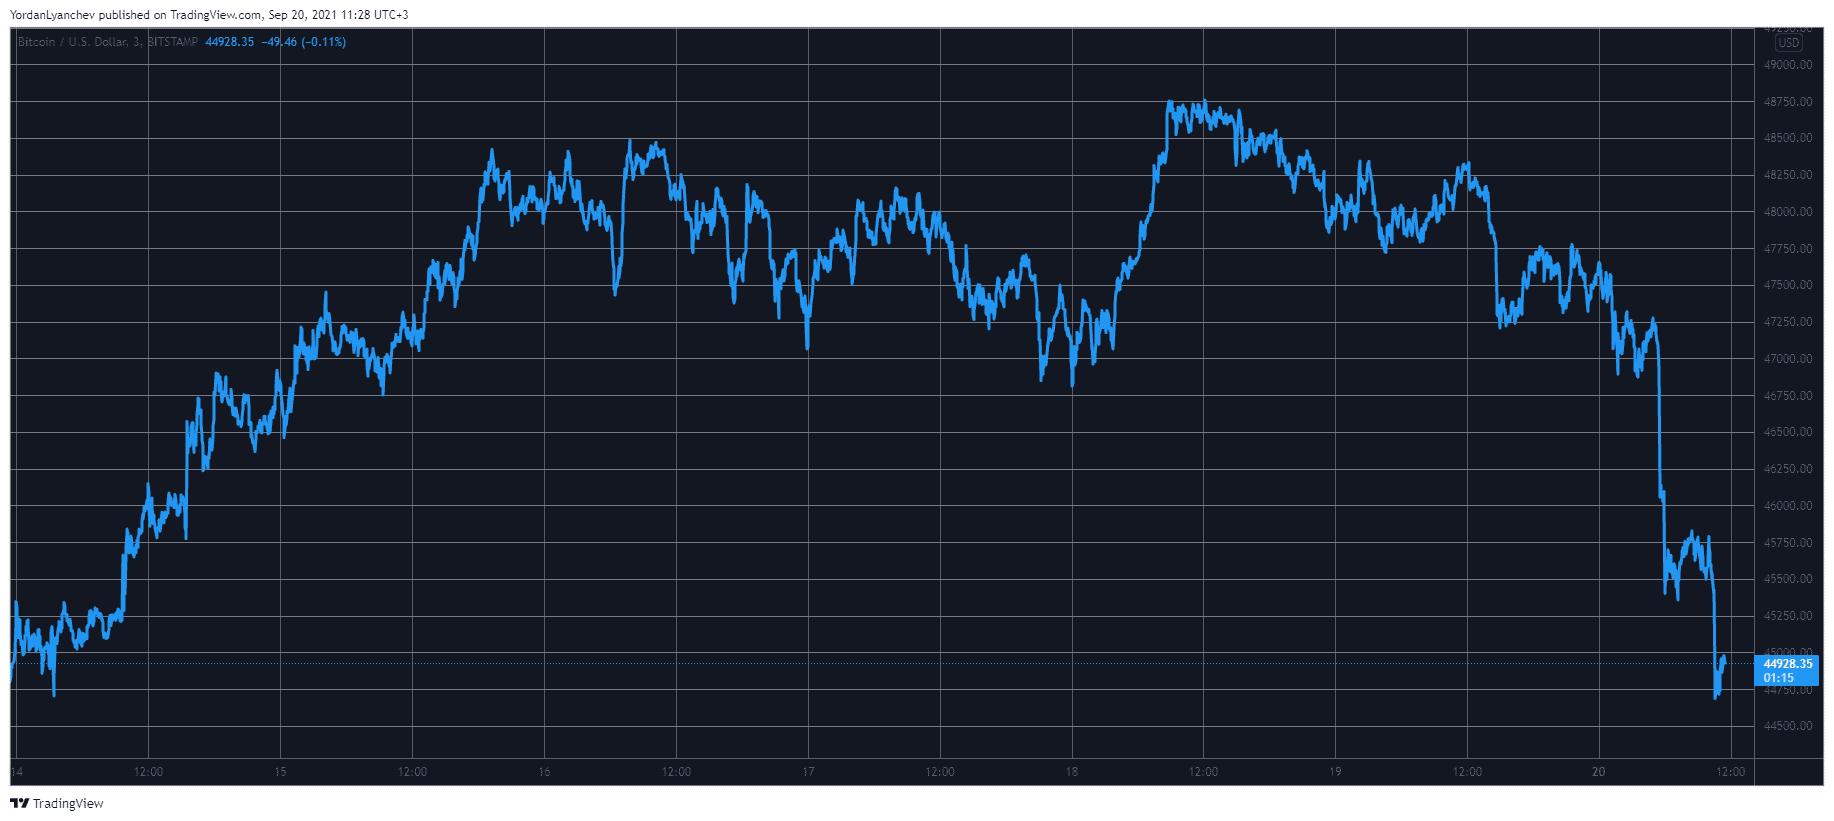 Bitcoin Plummets $4K in a Day Leaving $800M in Liquidations (Market Watch)